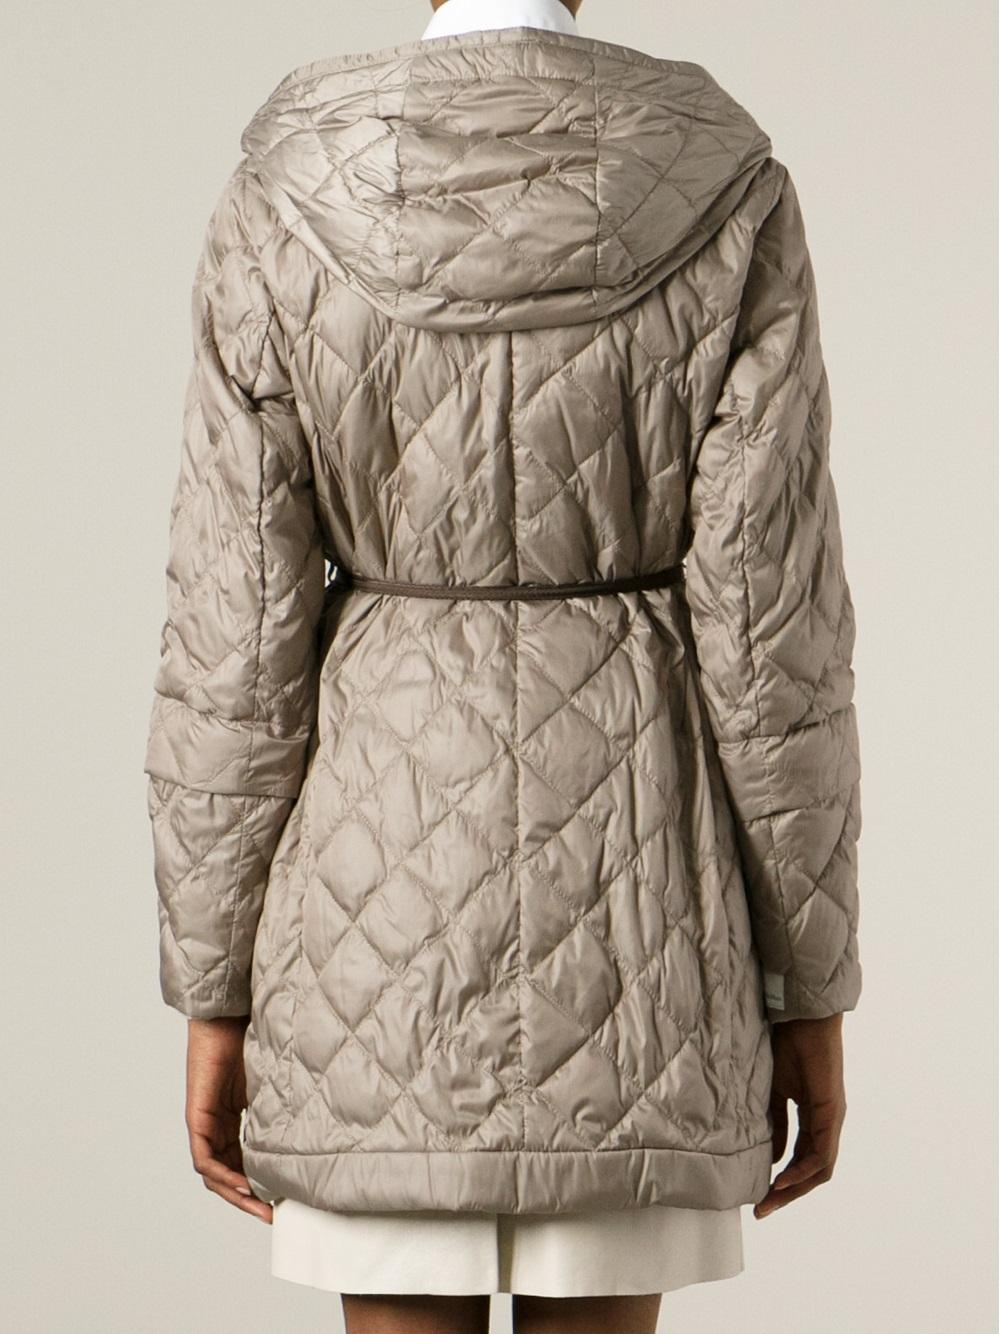 Lyst - Max mara Padded Coat in Natural : max mara quilted jacket - Adamdwight.com